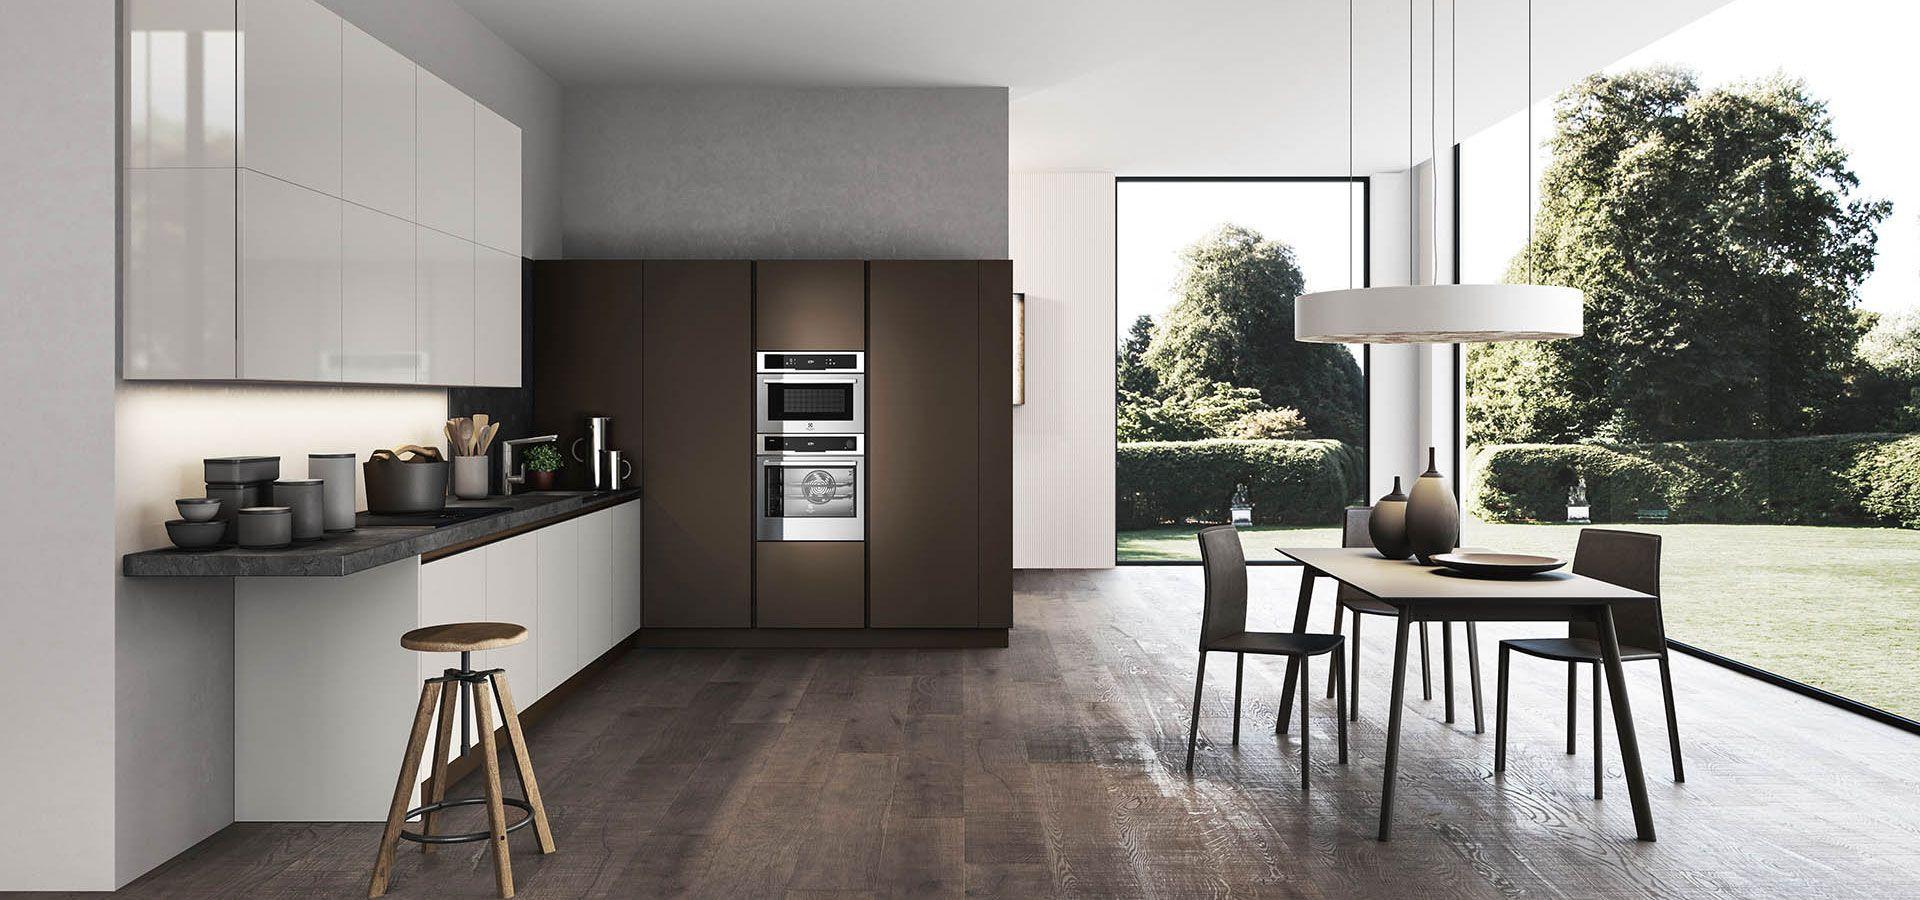 Pin di arredo3 su cucine moderne time kitchen design for Piccole cucine design